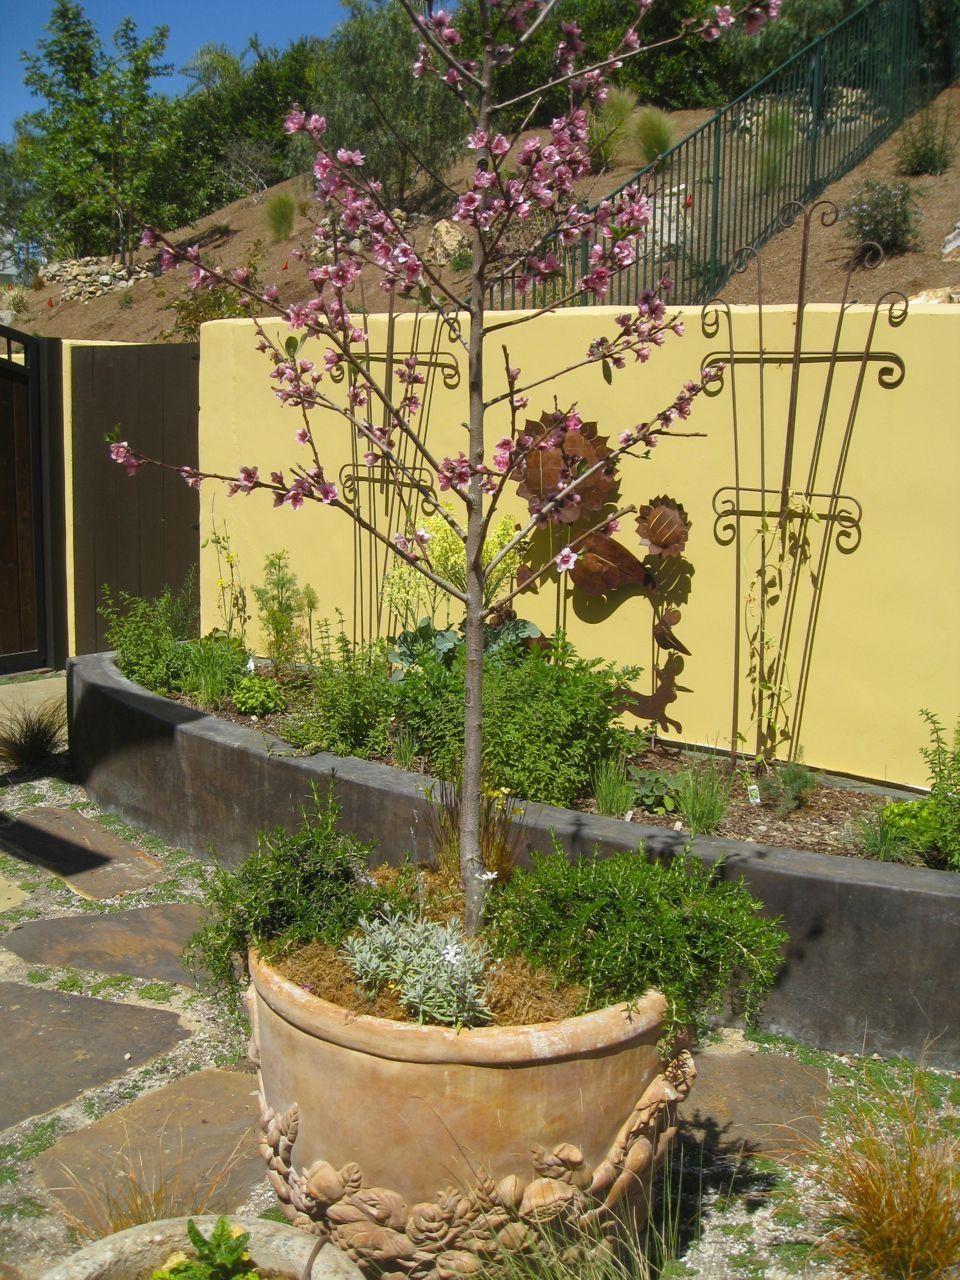 Best Photo Of Fruit Plants In Pots In The Small Backyard